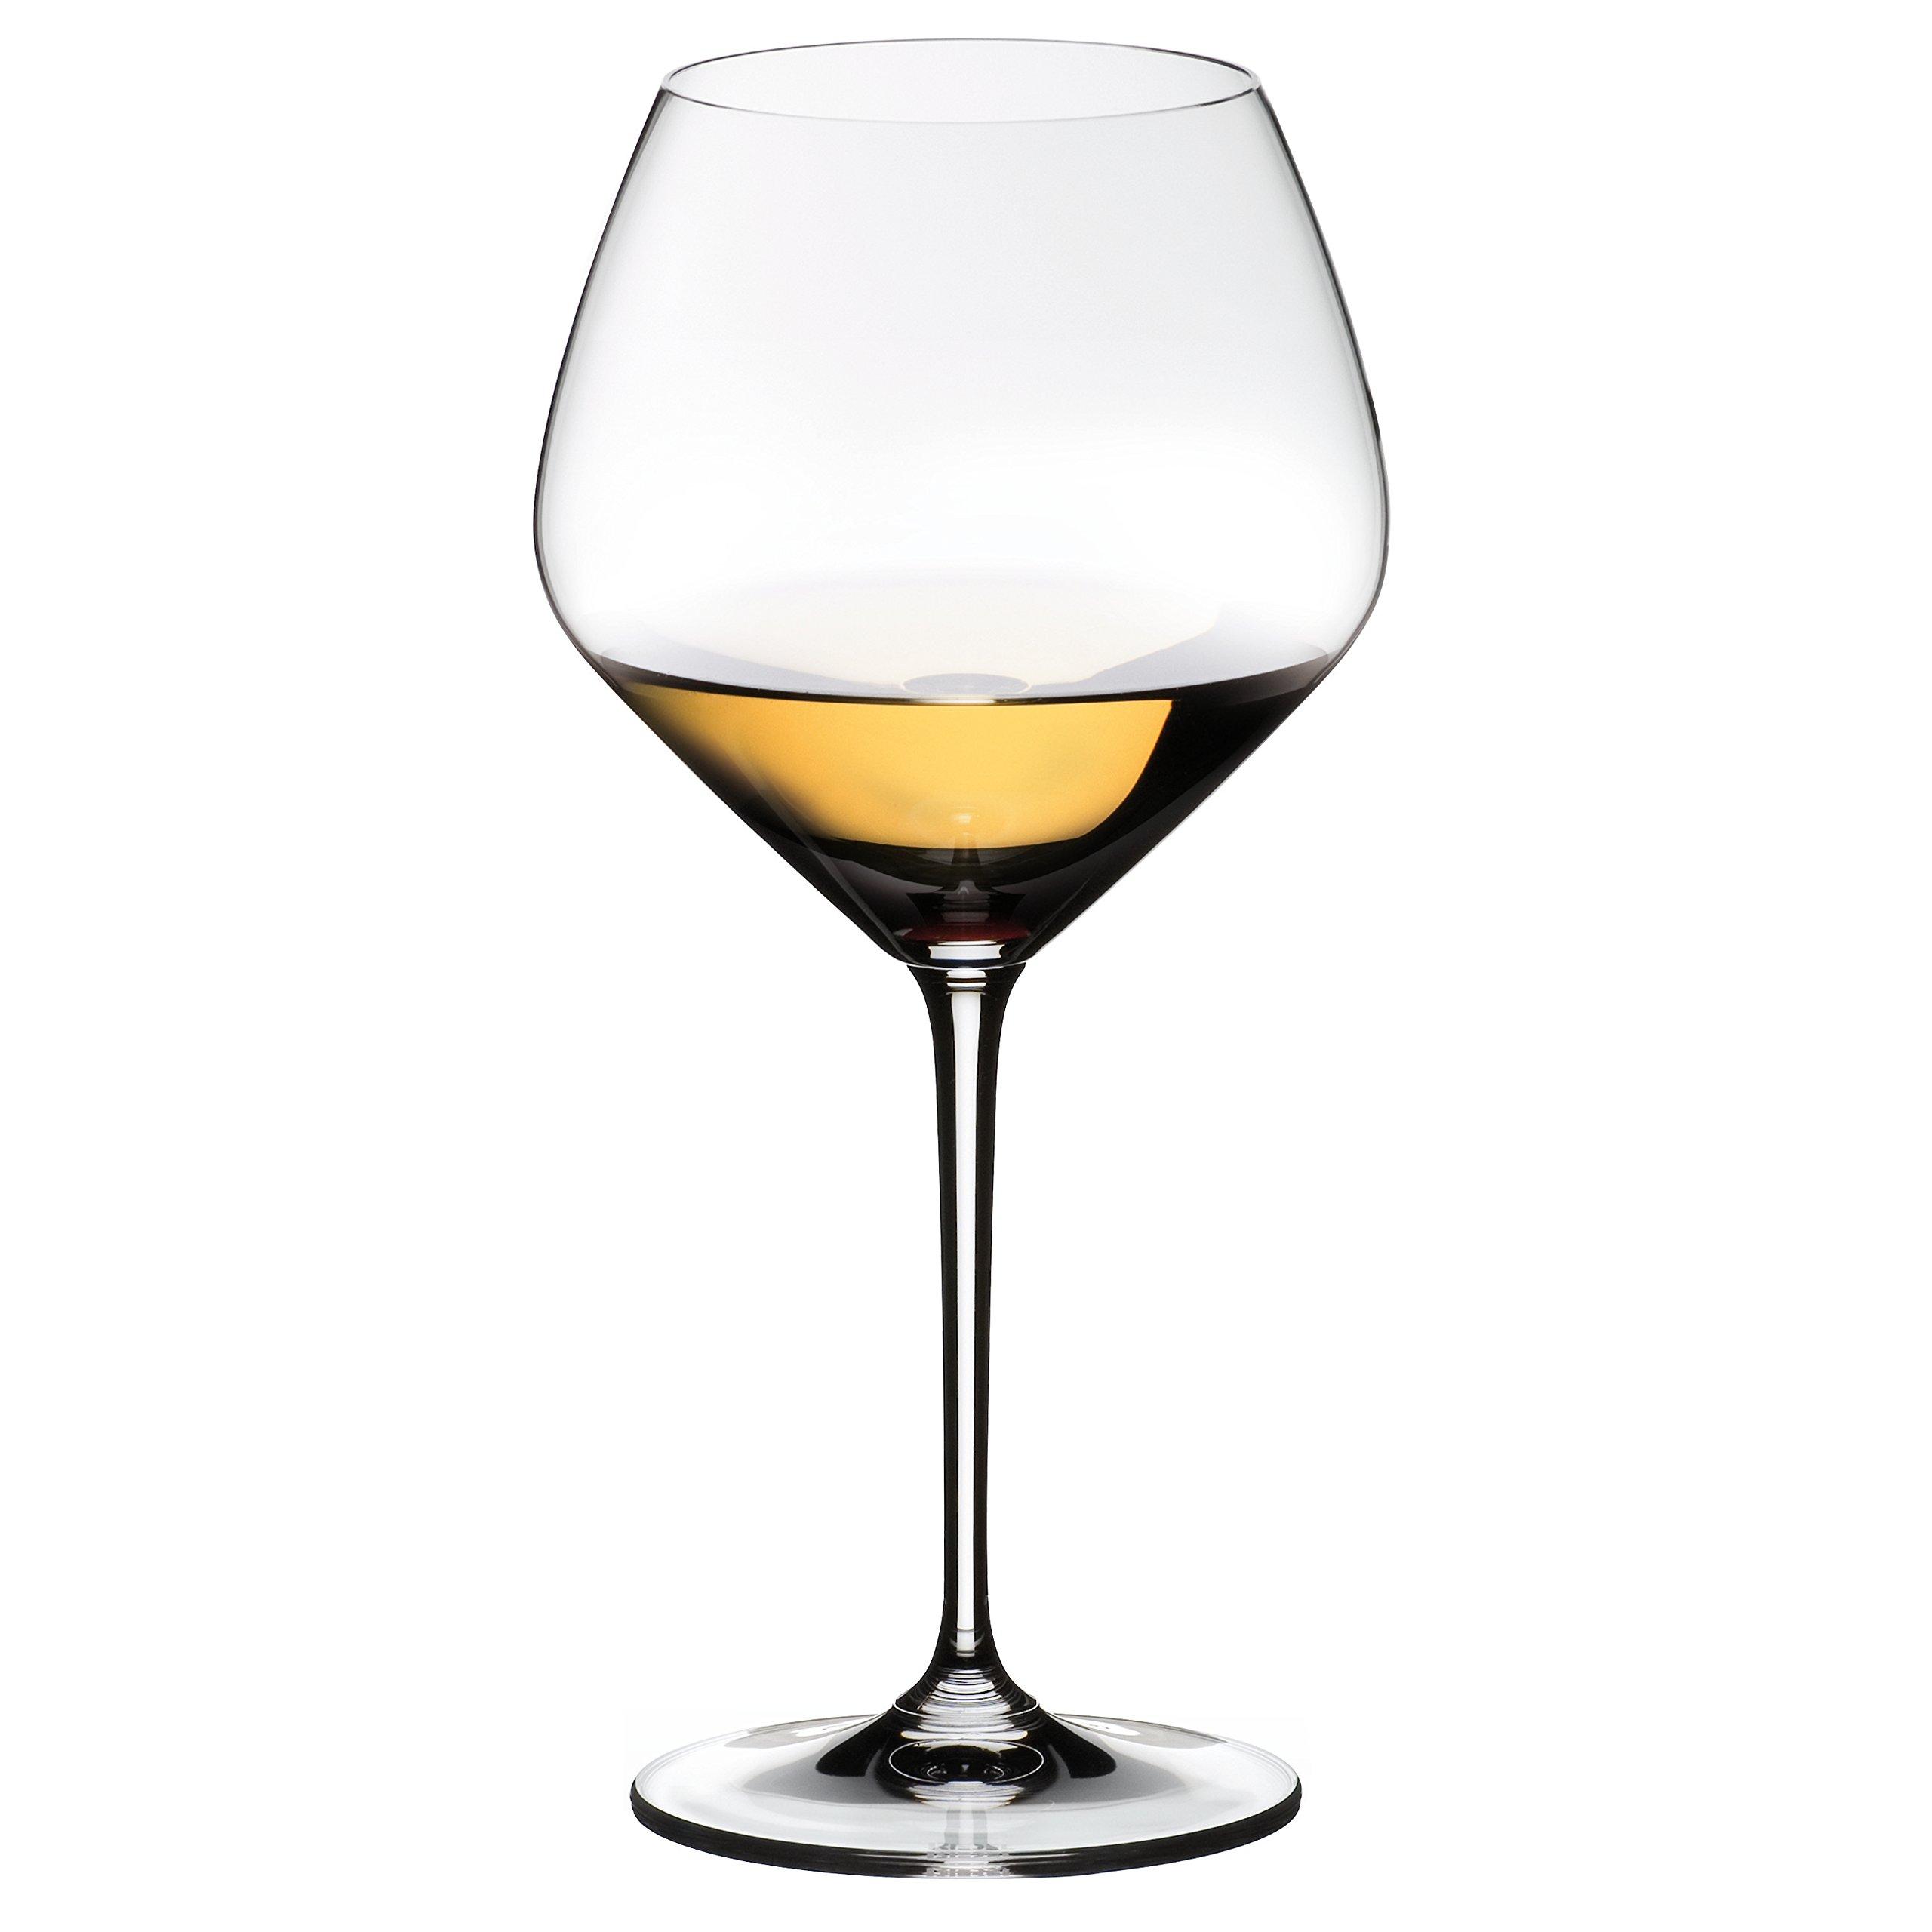 Riedel Vinum Extreme Leaded Crystal Chardonnay Wine Glass, Set of 6